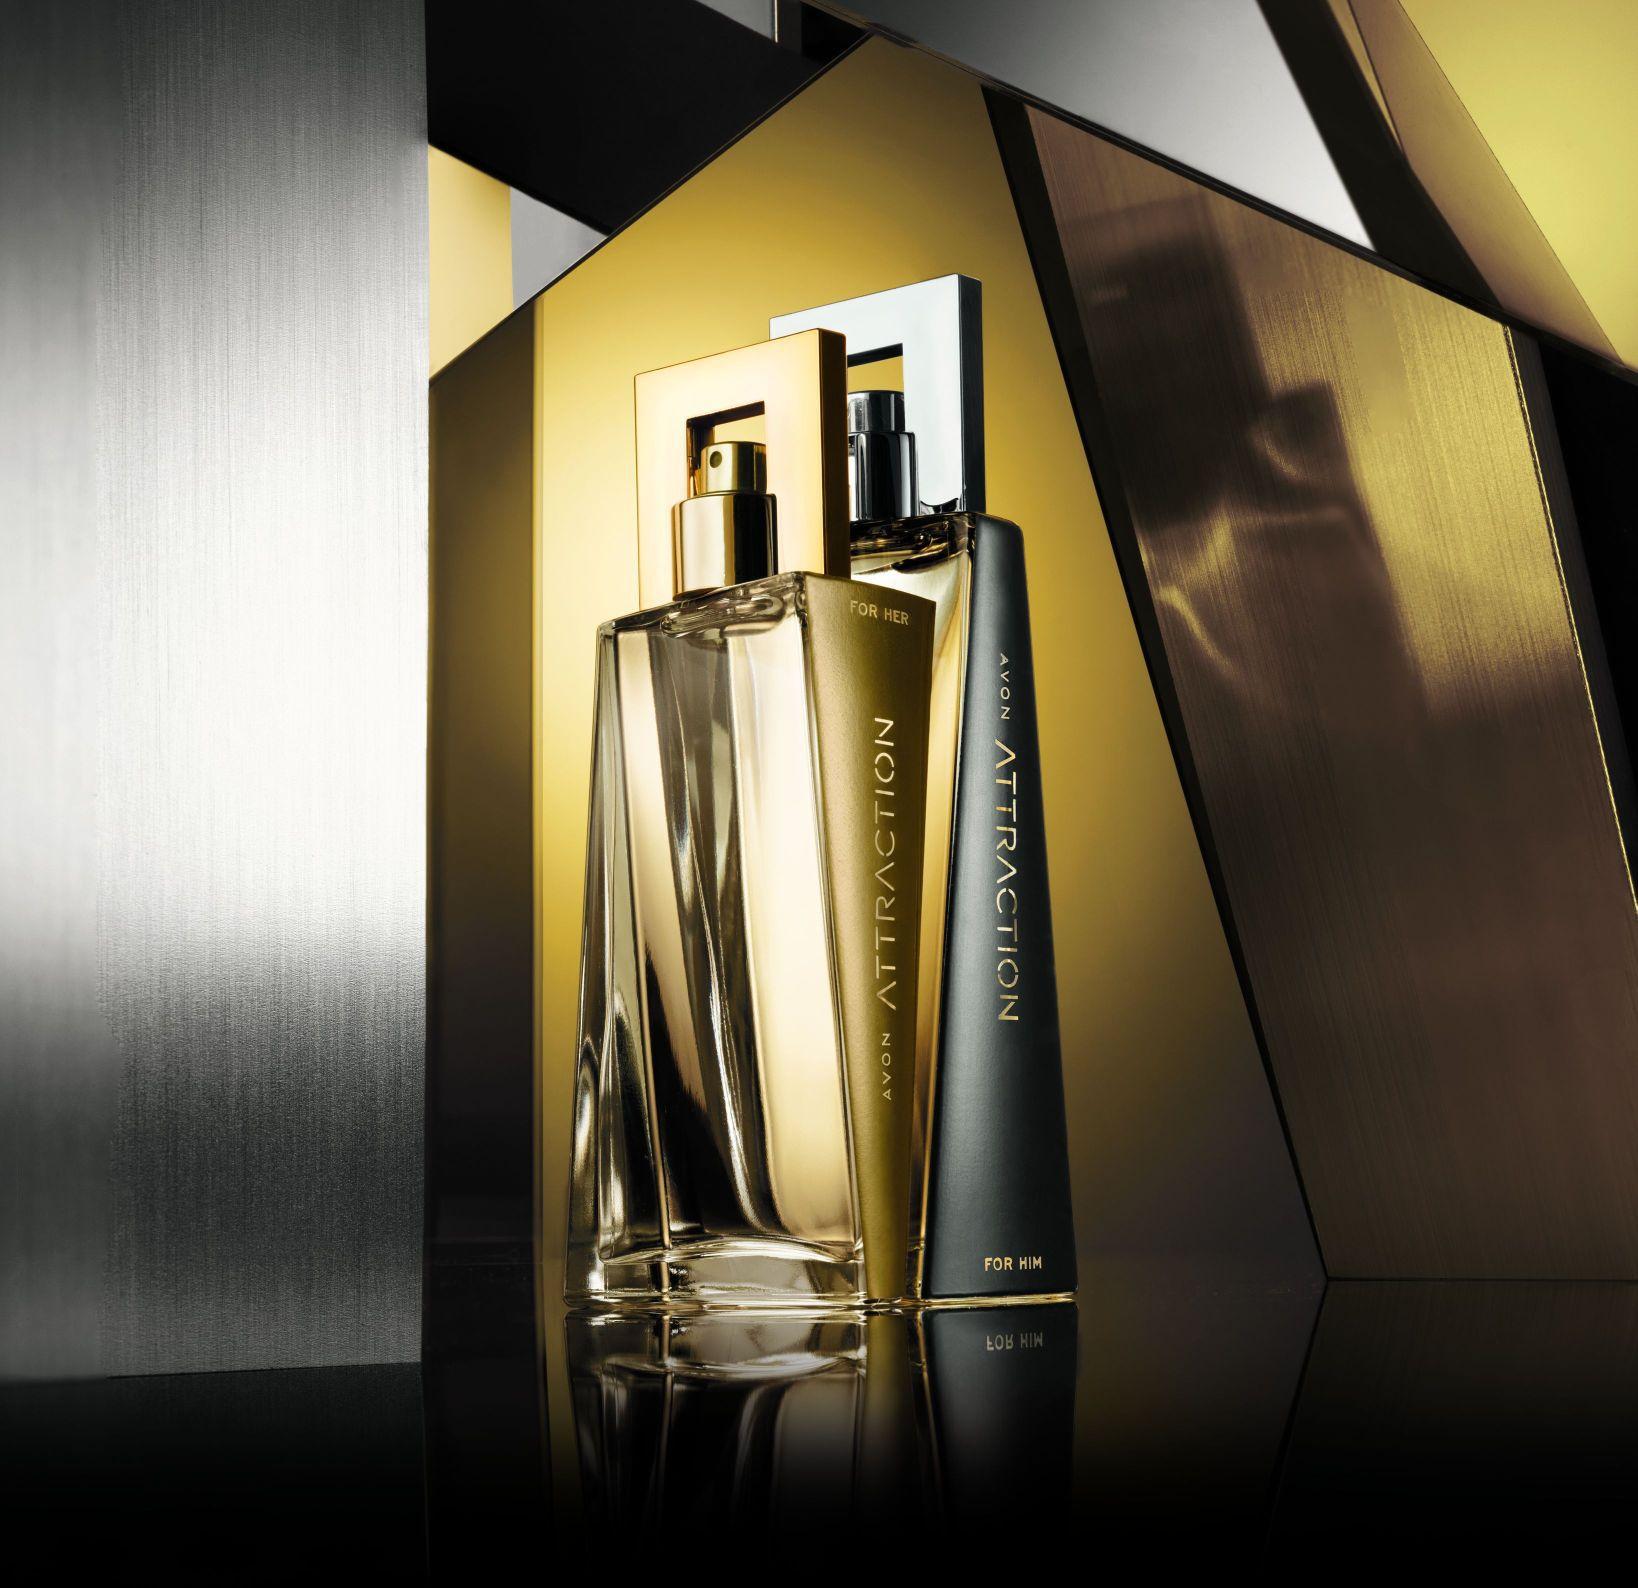 Magnetično privlačni mirisi iz Avona